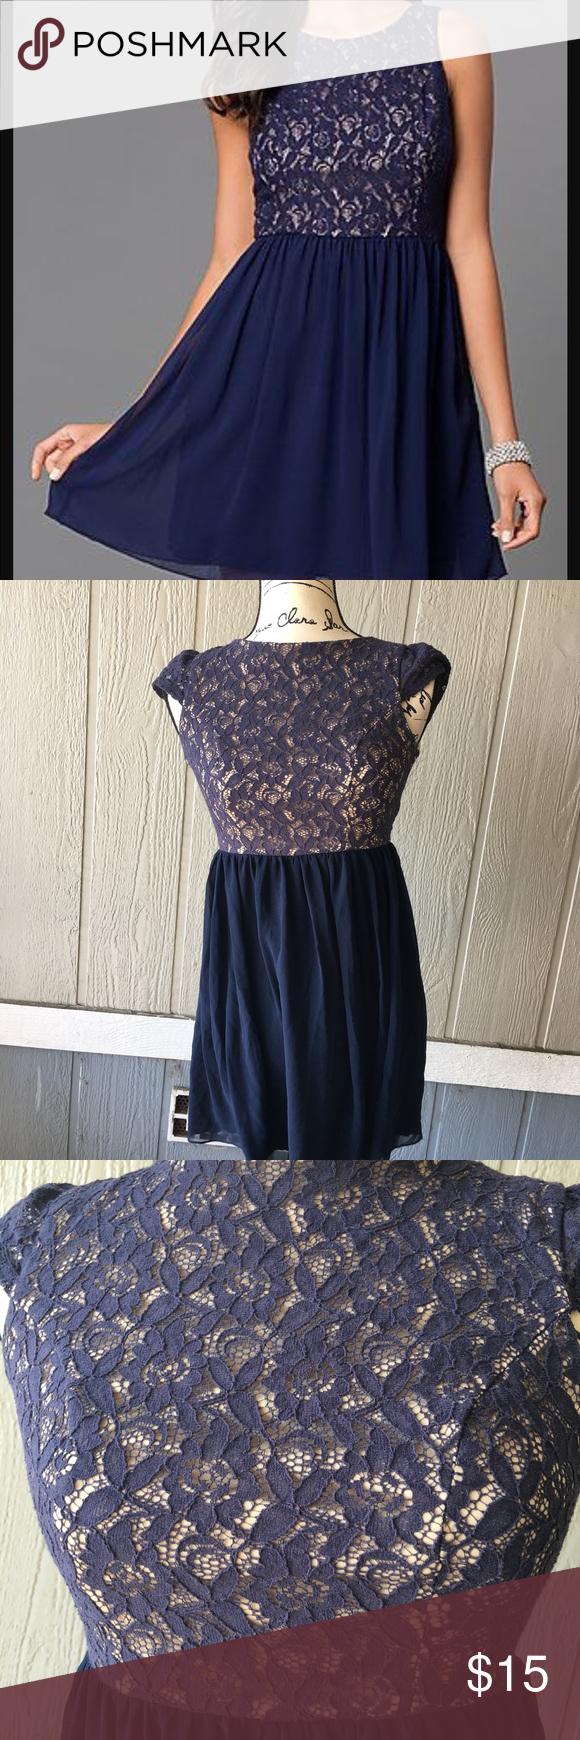 Emerald sundae navy blue lace dress lace dress emeralds and